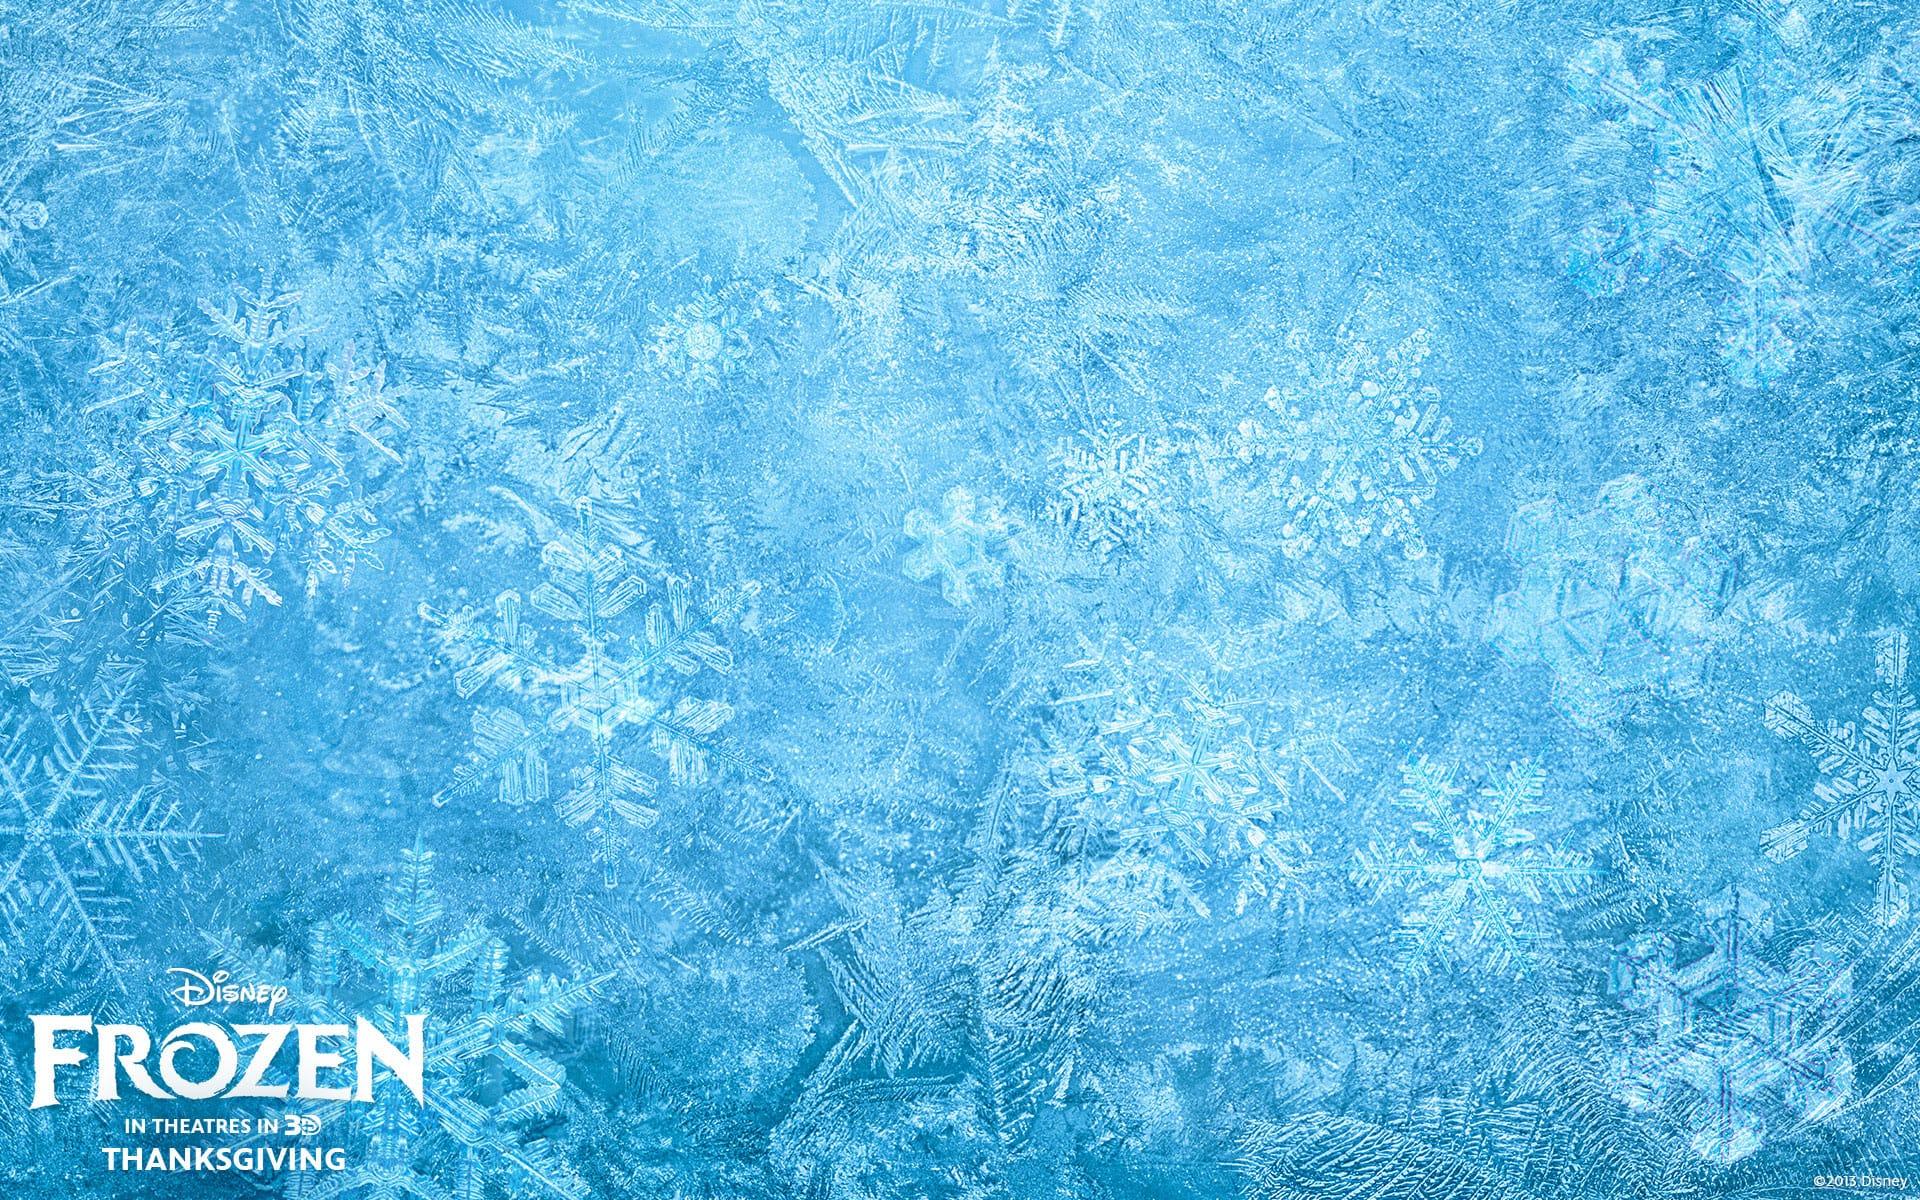 Frozen HD pics